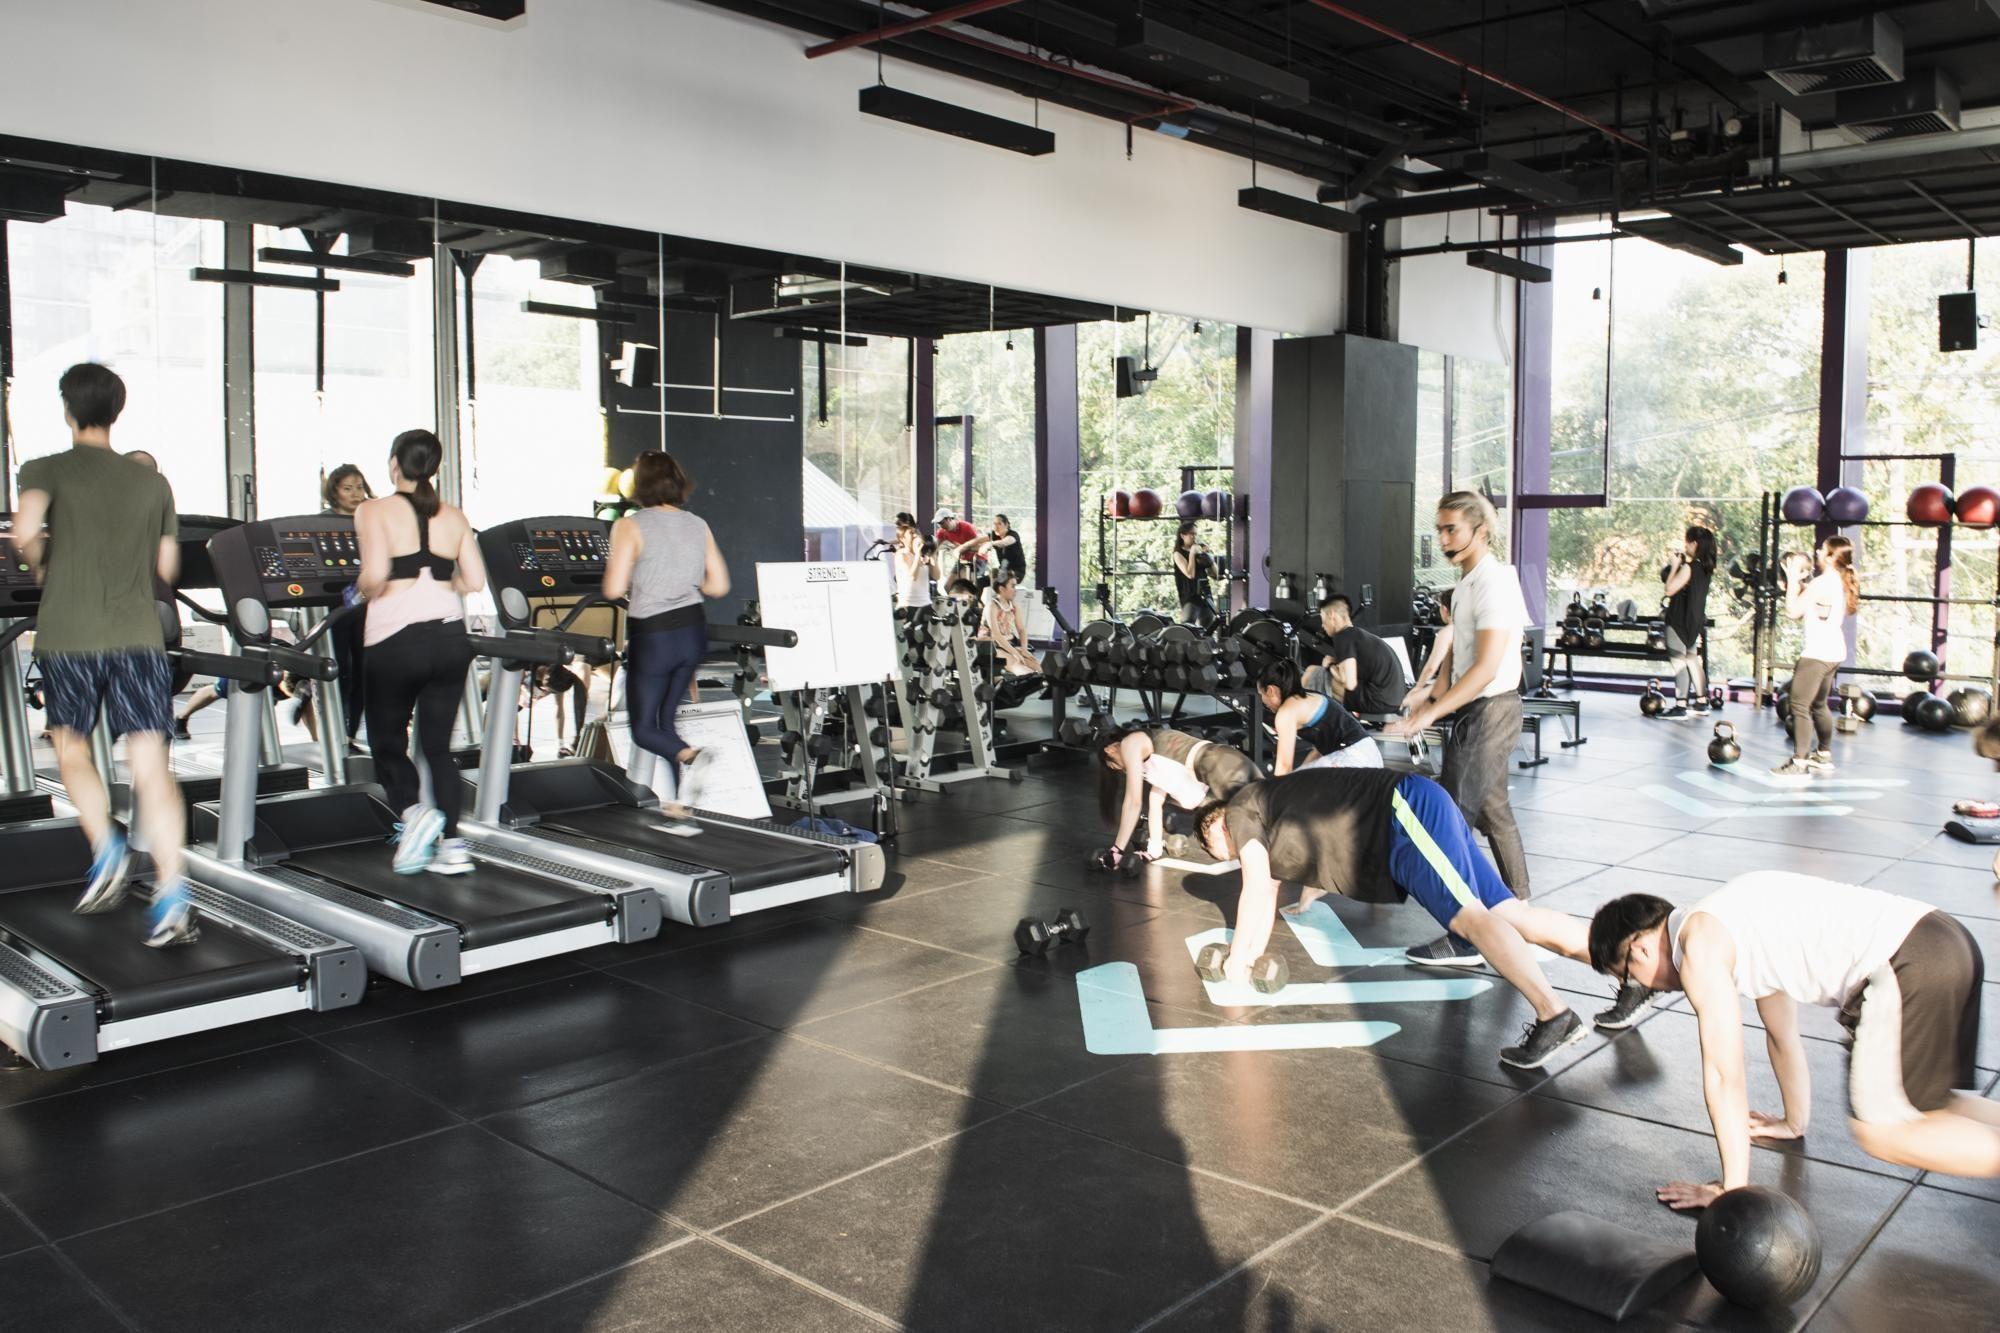 machines-salles-sport-wd